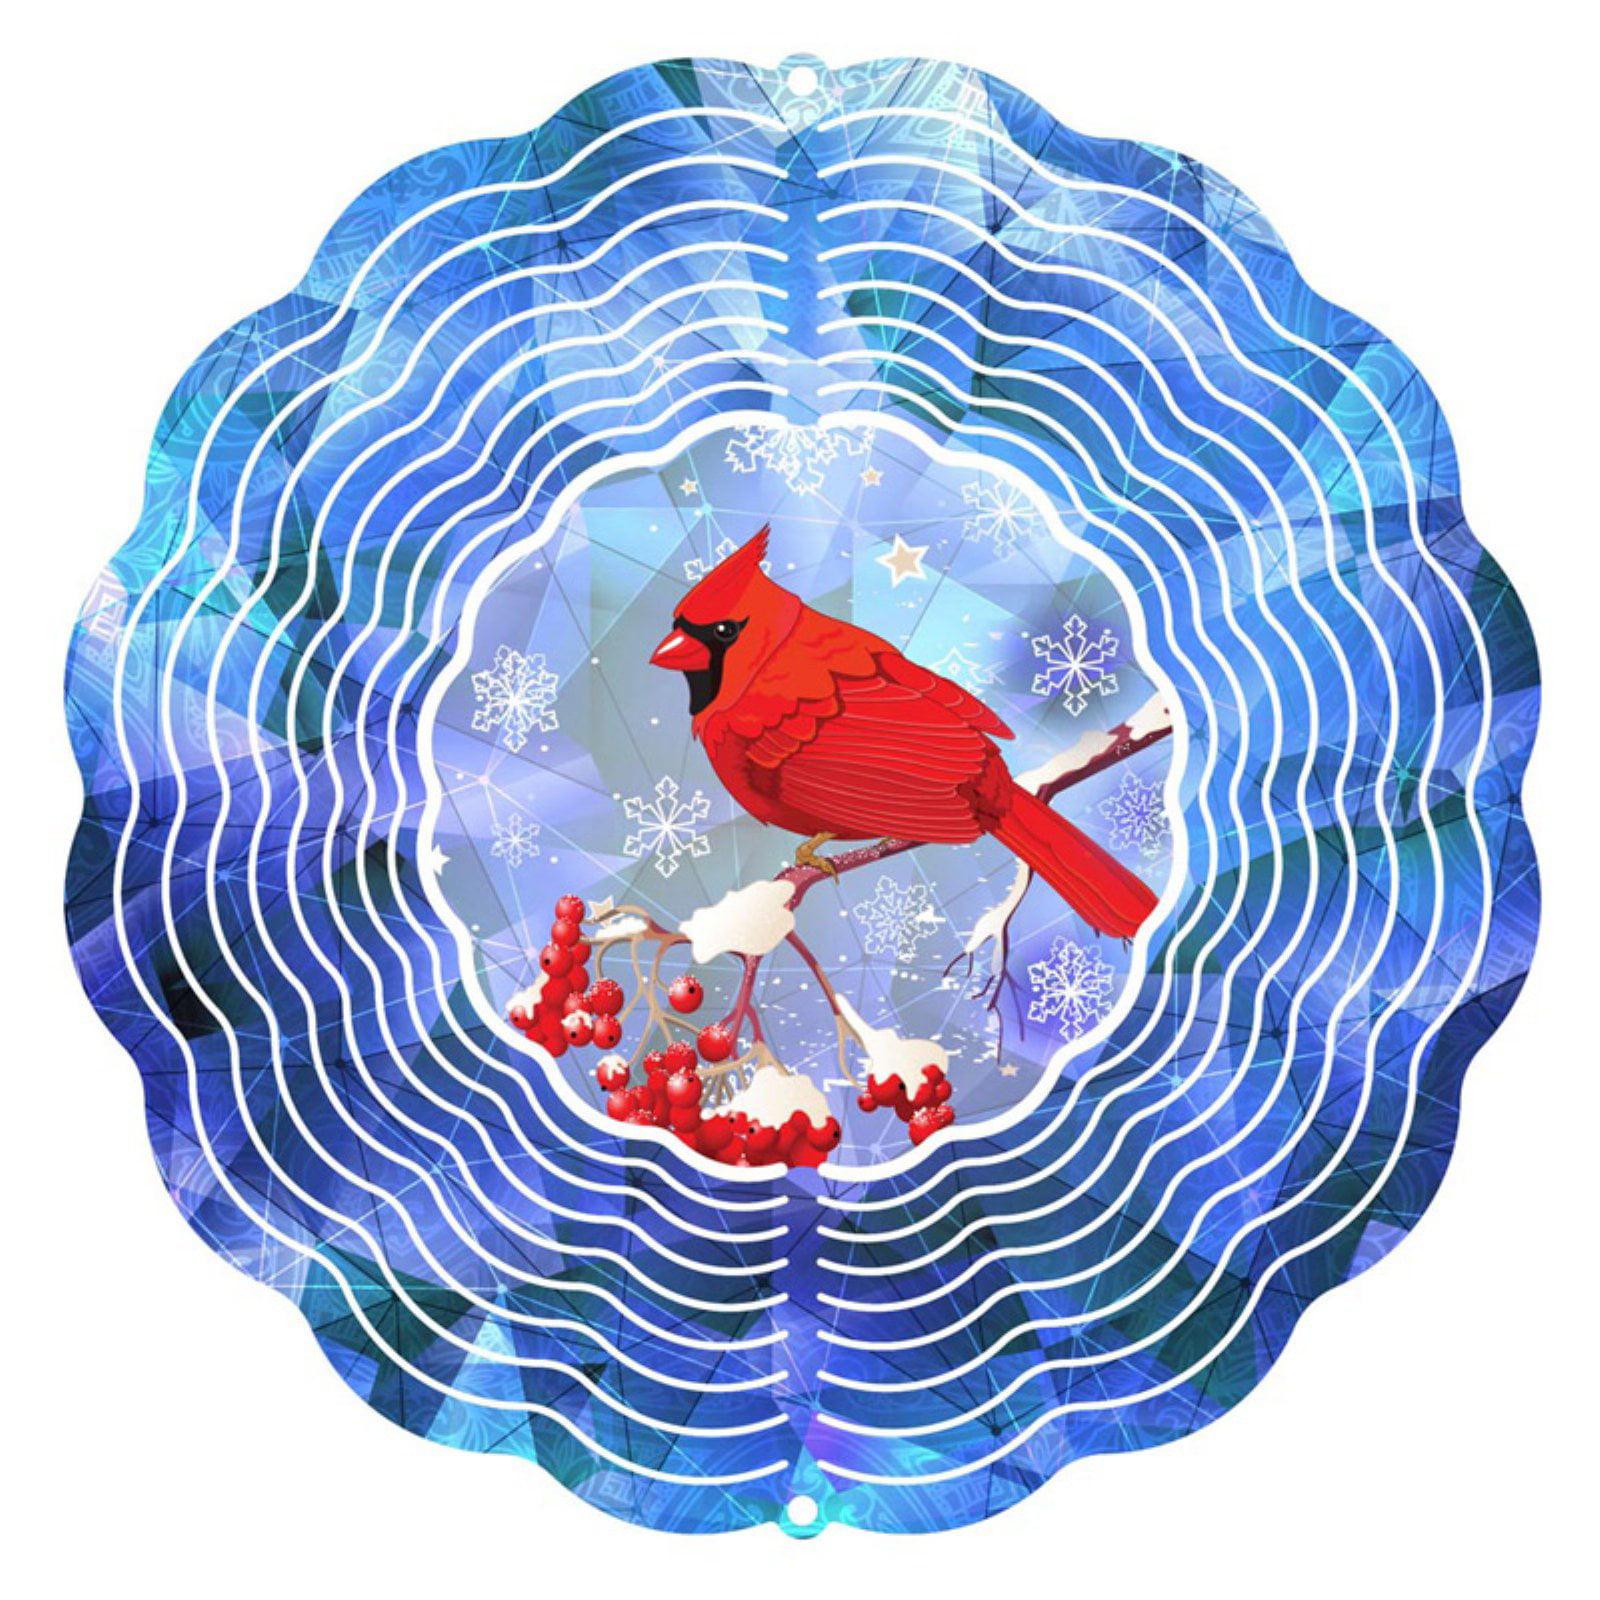 Next Innovations Winter Cardinal Wind Spinner by Next Innovations